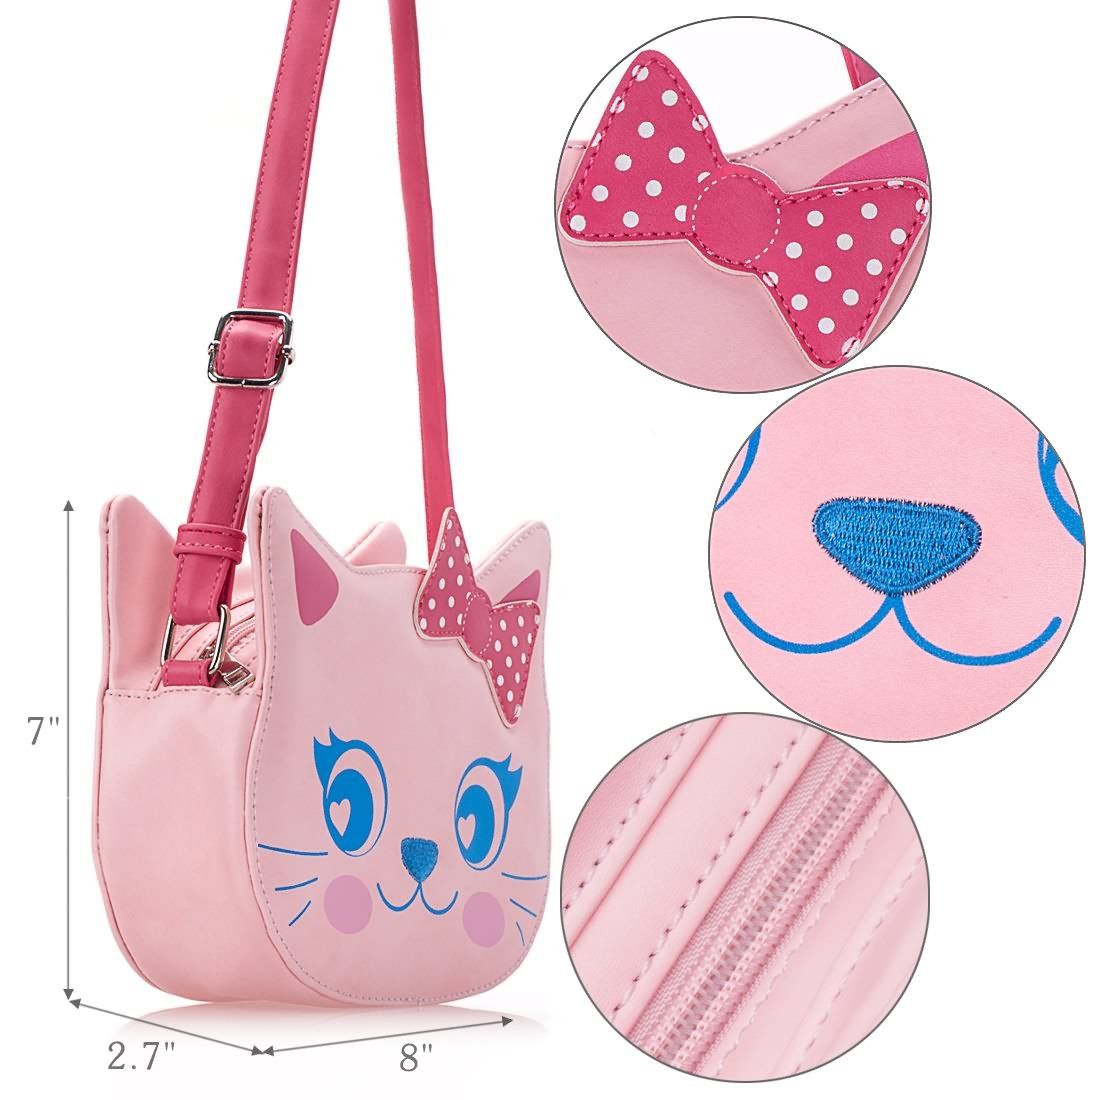 42a8a000ed98 Ava    Kings Little Girl Faux Leather Fun Design Shaped Purse Handbag  Bundle Monster